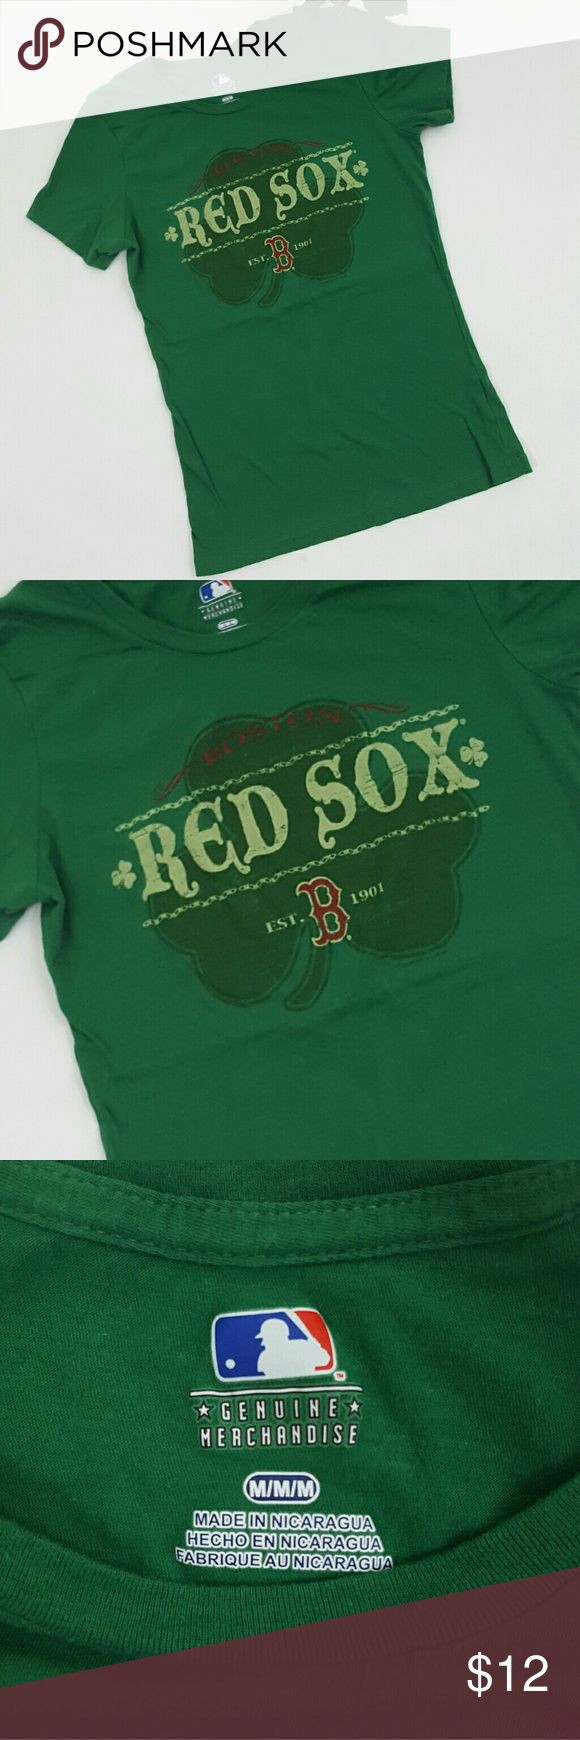 MLB Red Sox Green Shamrock T-Shirt  Sz M EUC! Tops Tees - Short Sleeve